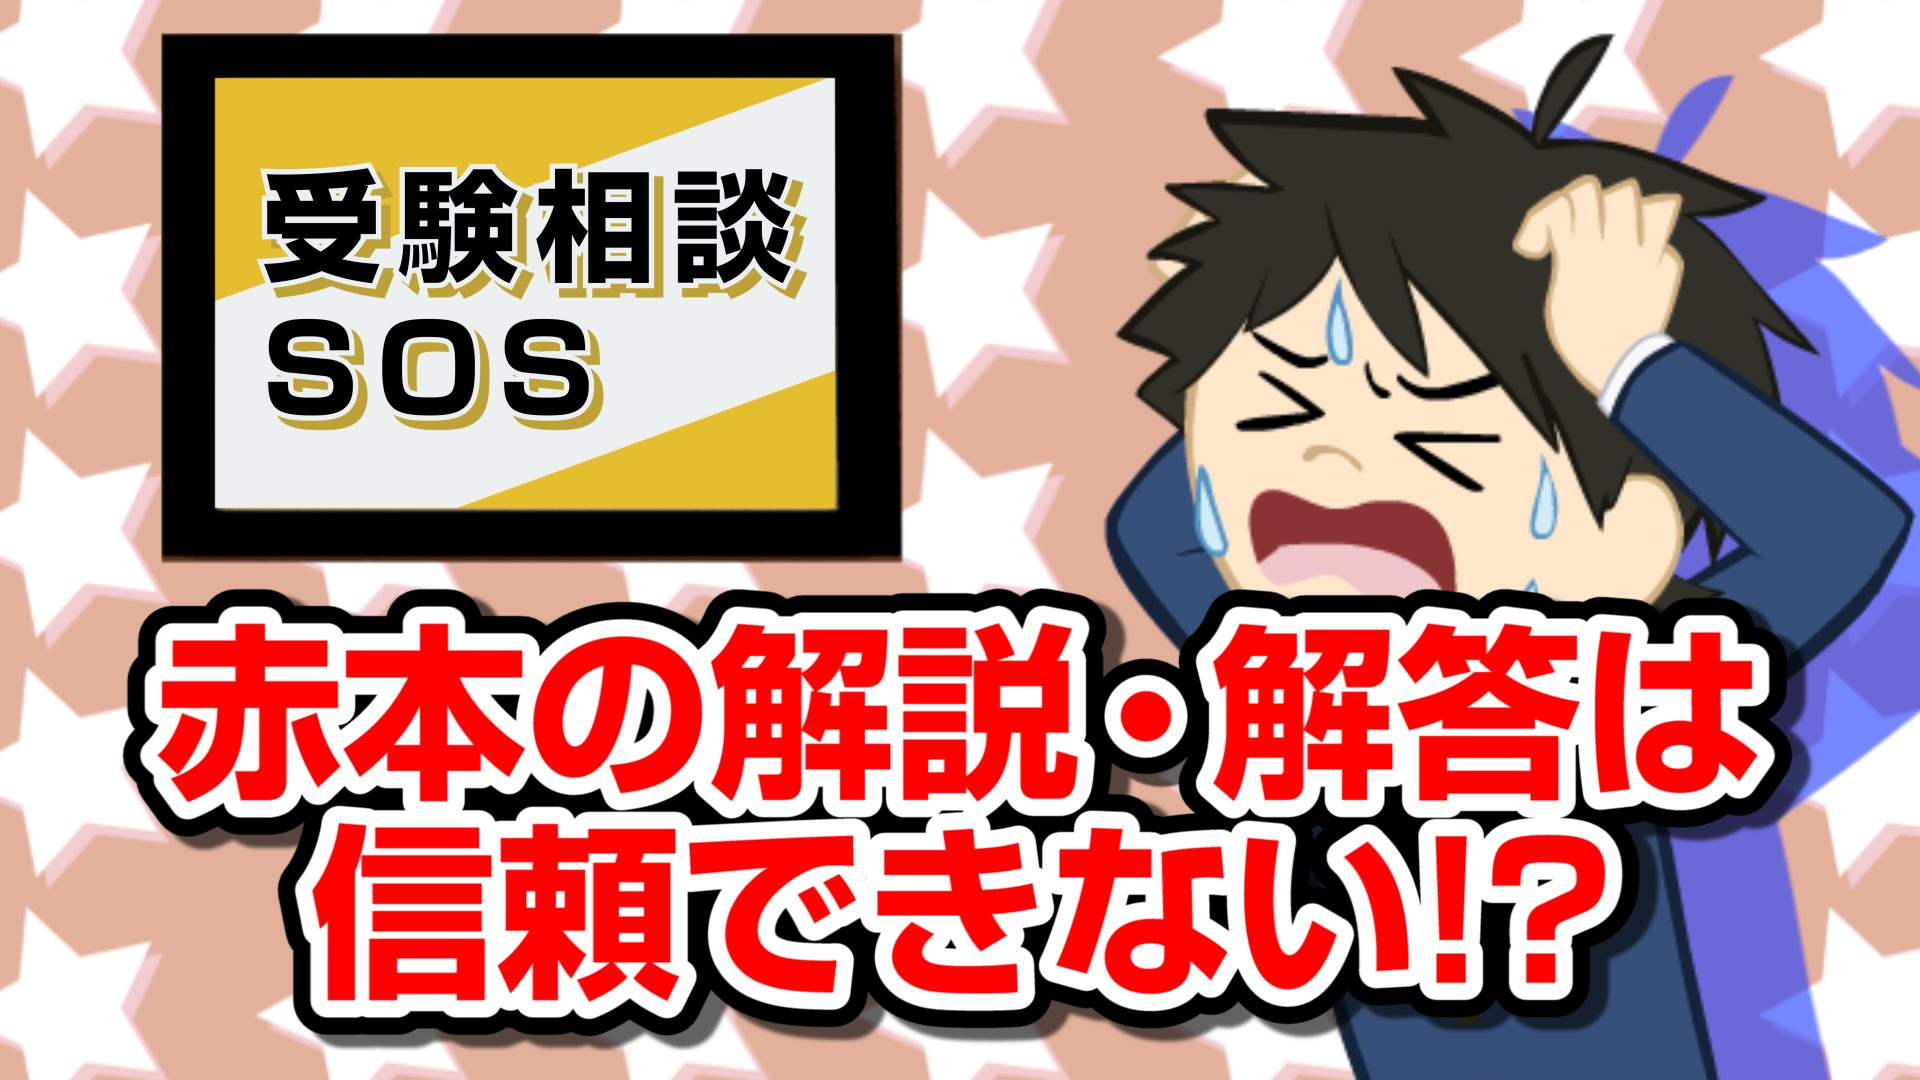 【vol.81】赤本の解説・解答は信頼できない!?|受験相談SOS